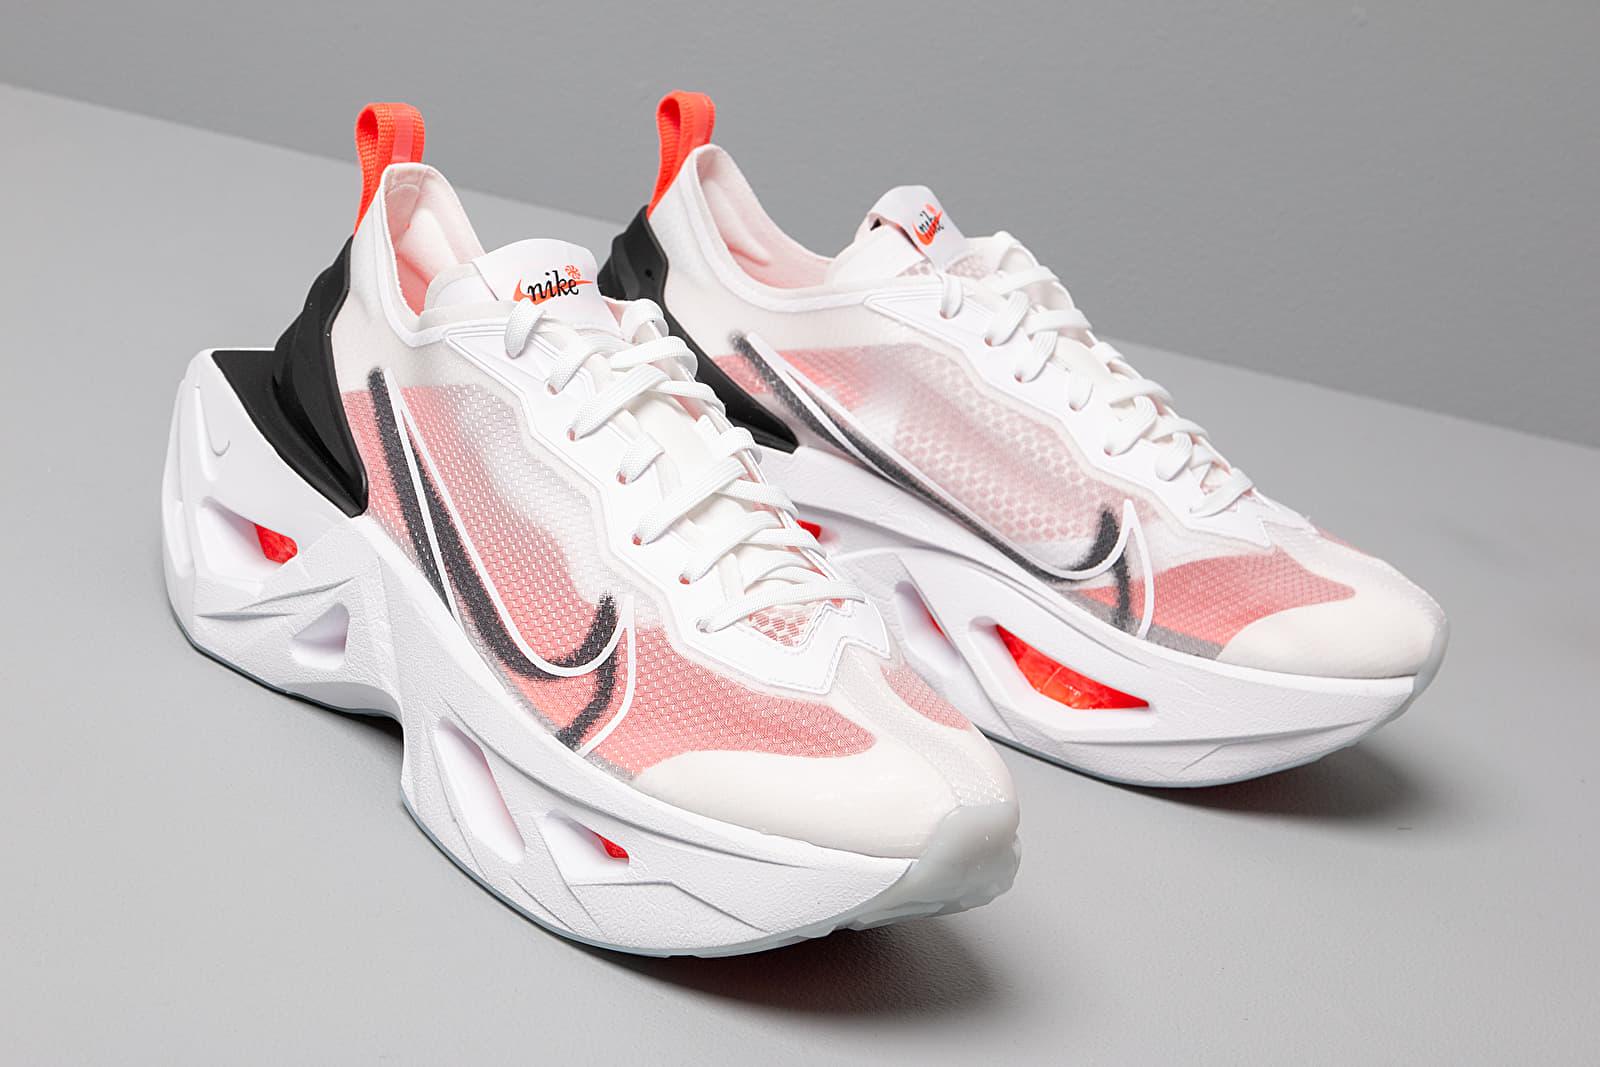 dolor Colega Lío  Women's shoes Nike W Zoom X Vista Grind White/ Black-Bright Crimson |  Footshop